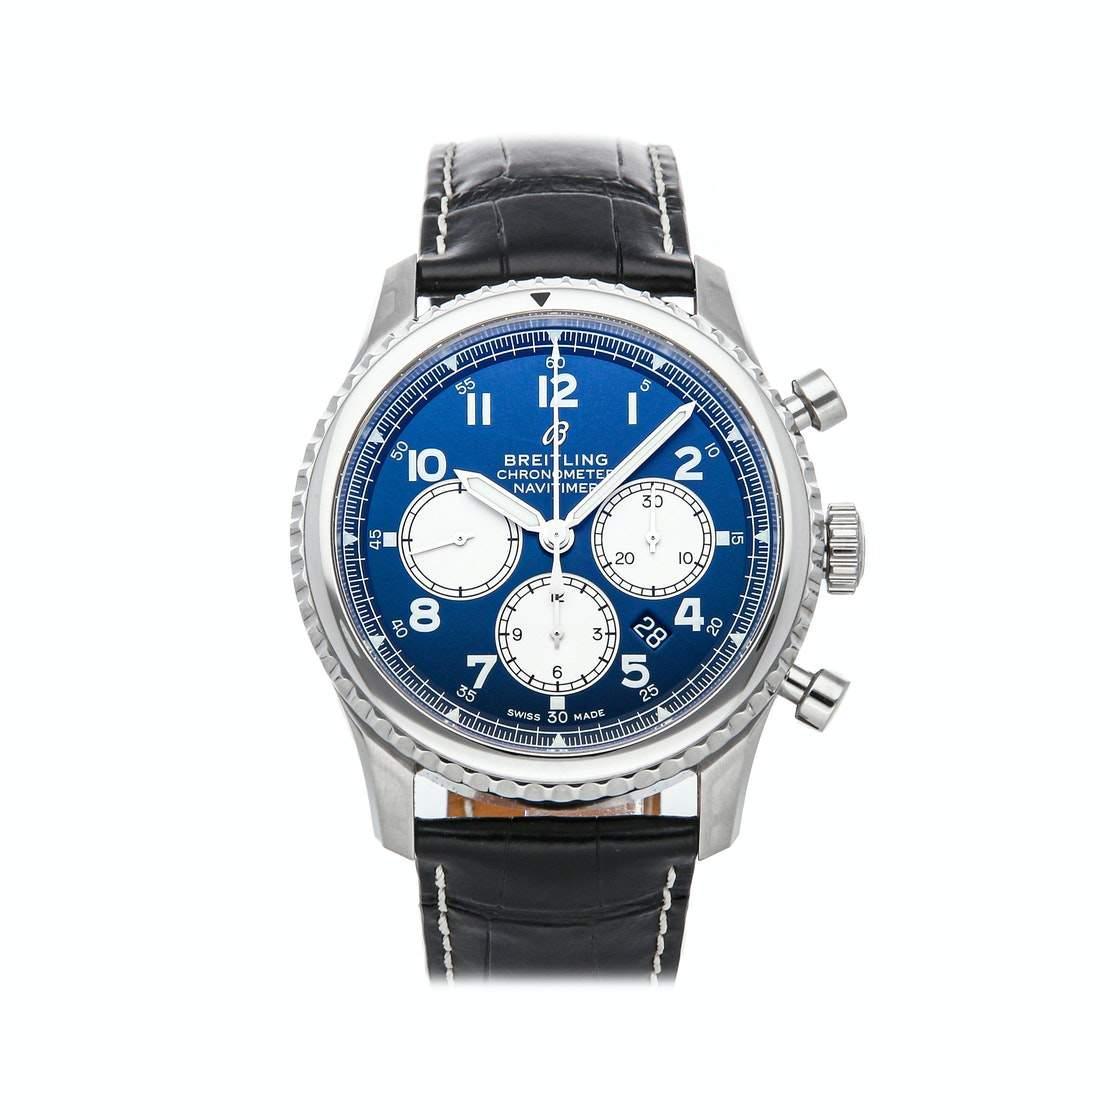 Breitling Bleu Stainless Steel Navitimer 8 B01 Chronograph AB0117131C1P1 Men's Wristwatch 43 MM